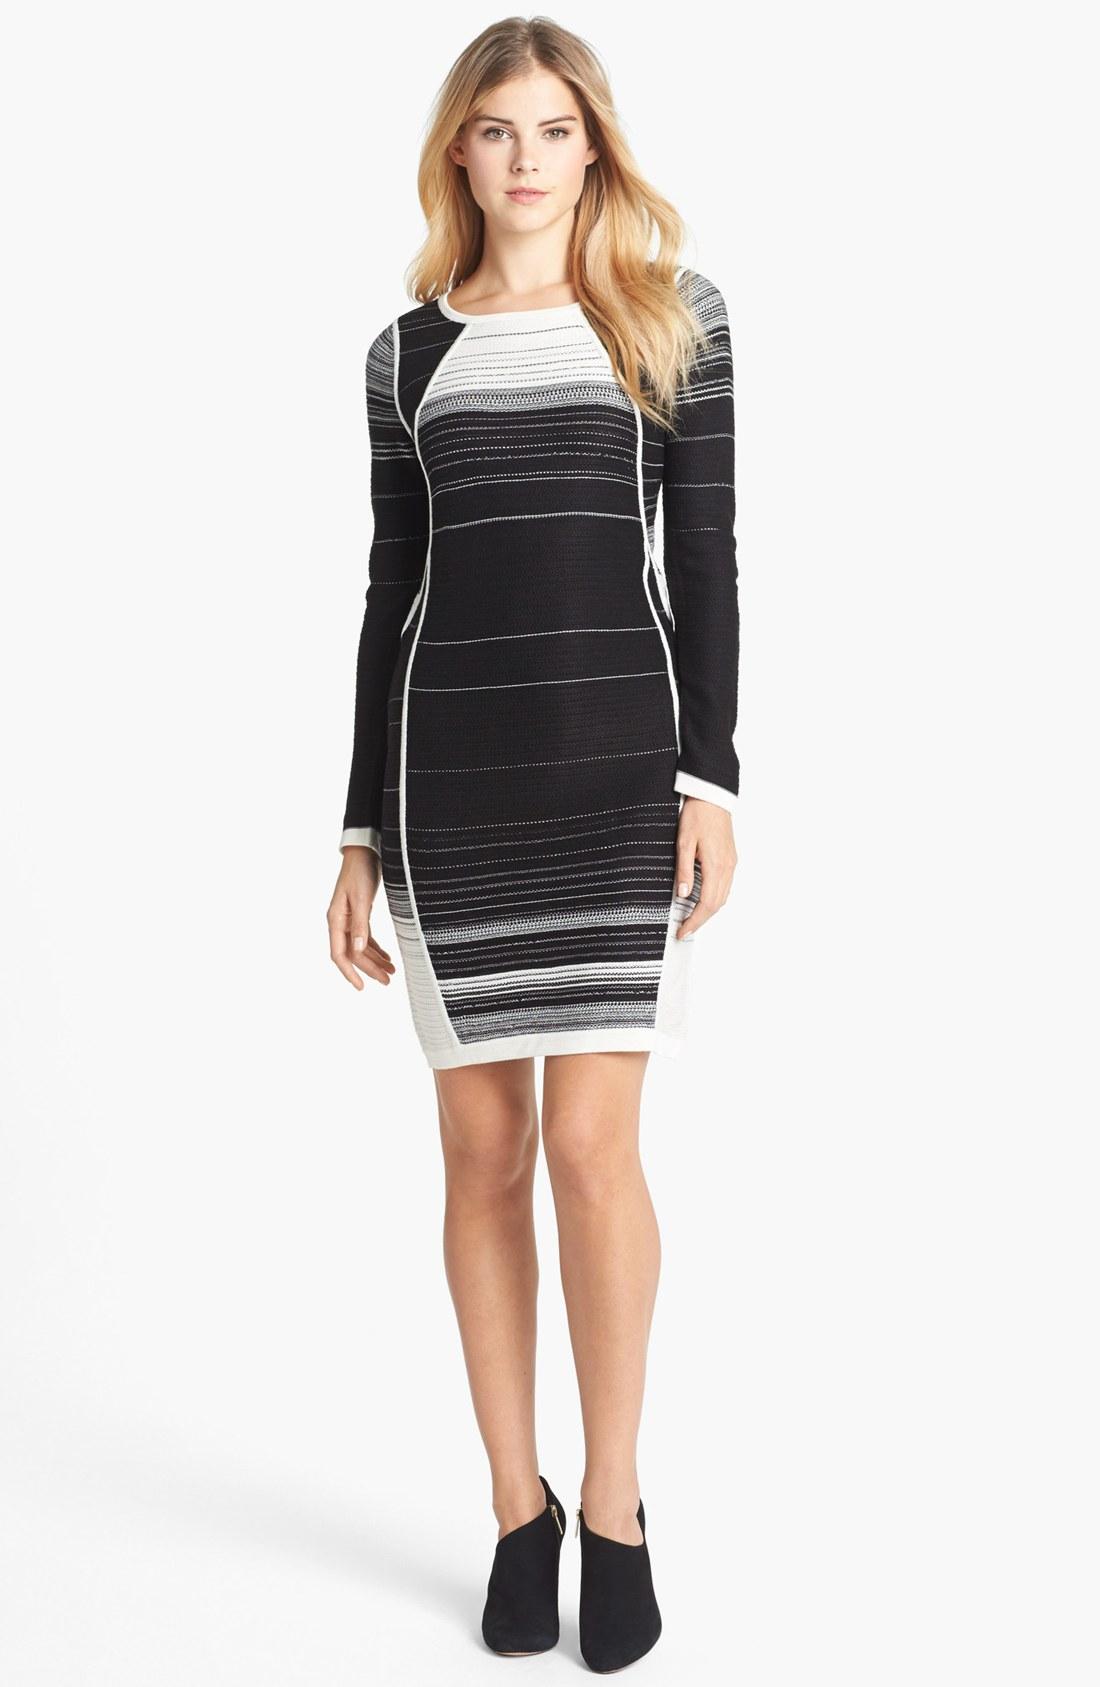 Accessorize A Sweater Dress